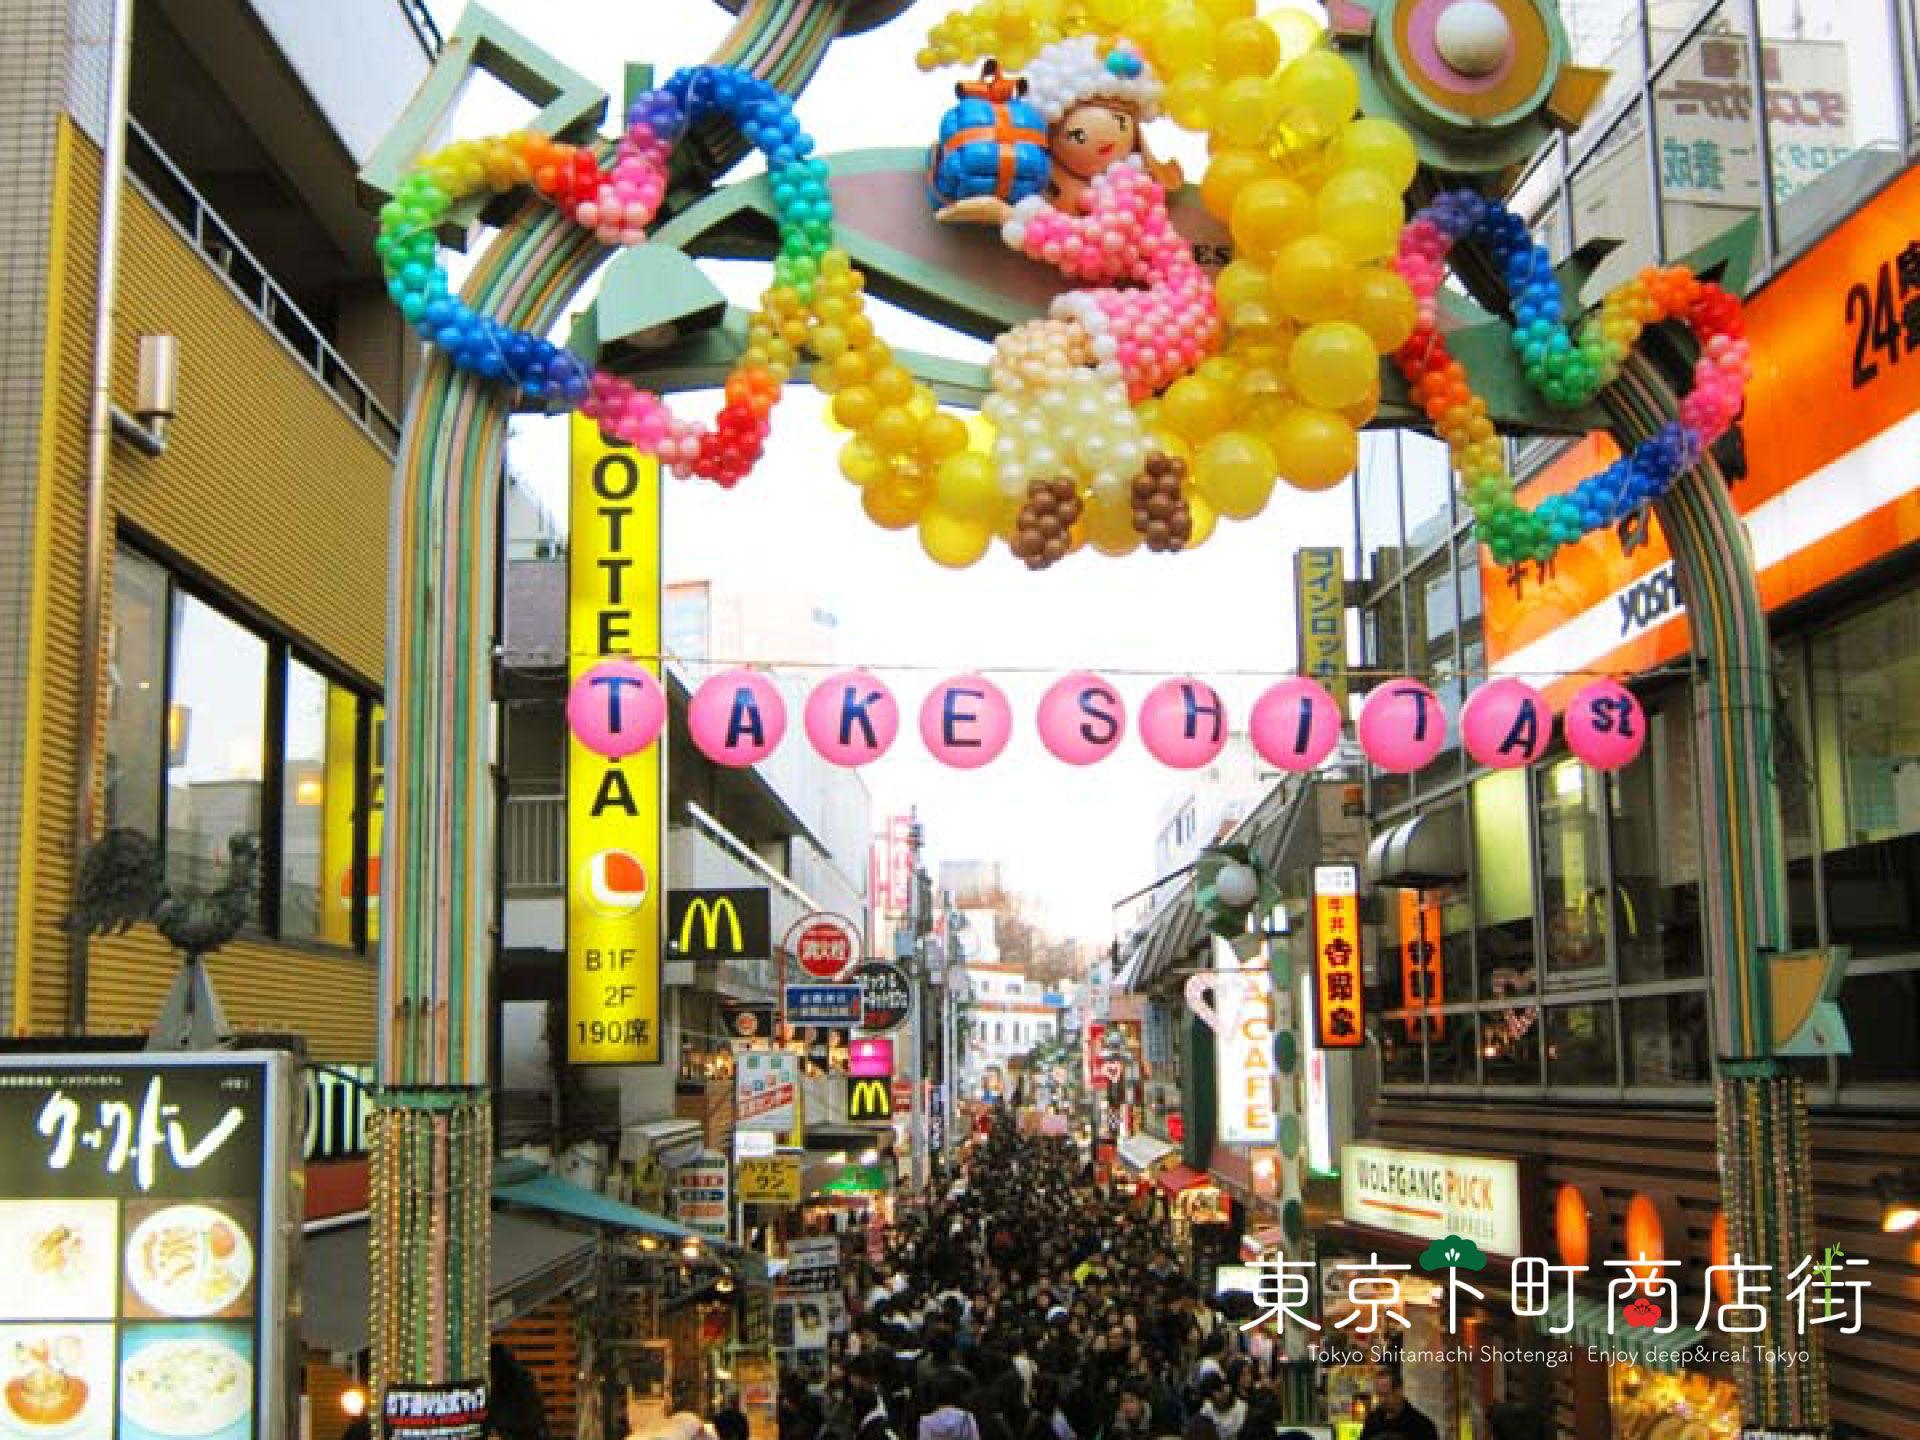 Japanese Culture in Tokyo - Tokyo Shitamachi Shotengai Project coming soon 2017!!